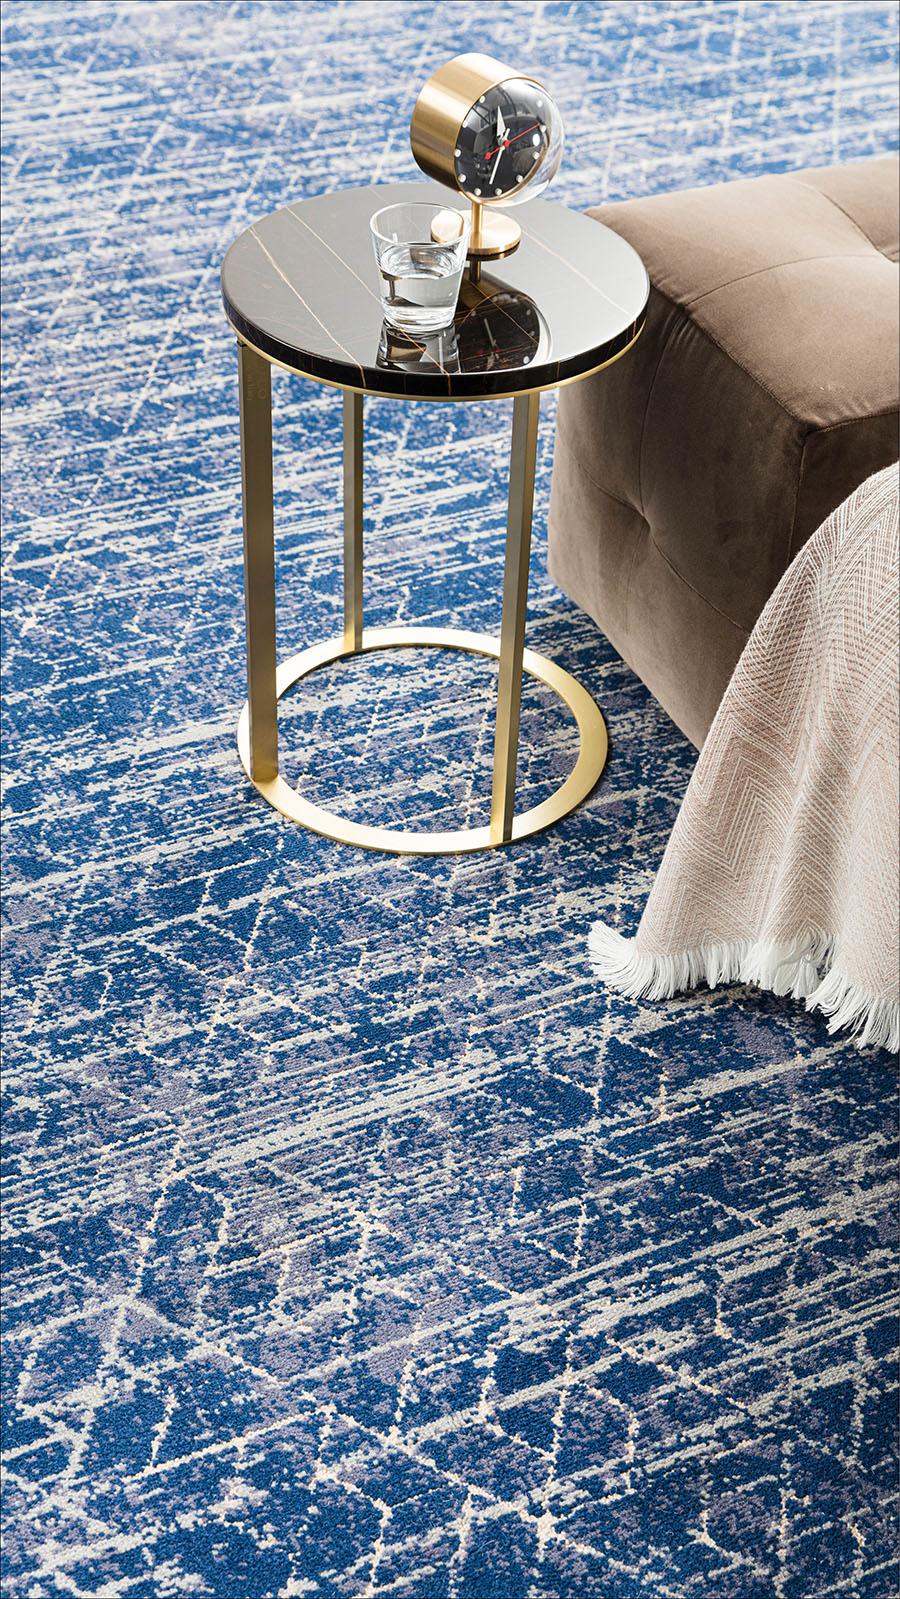 desso-tekstilne-rolne-klasično-plava-pantone